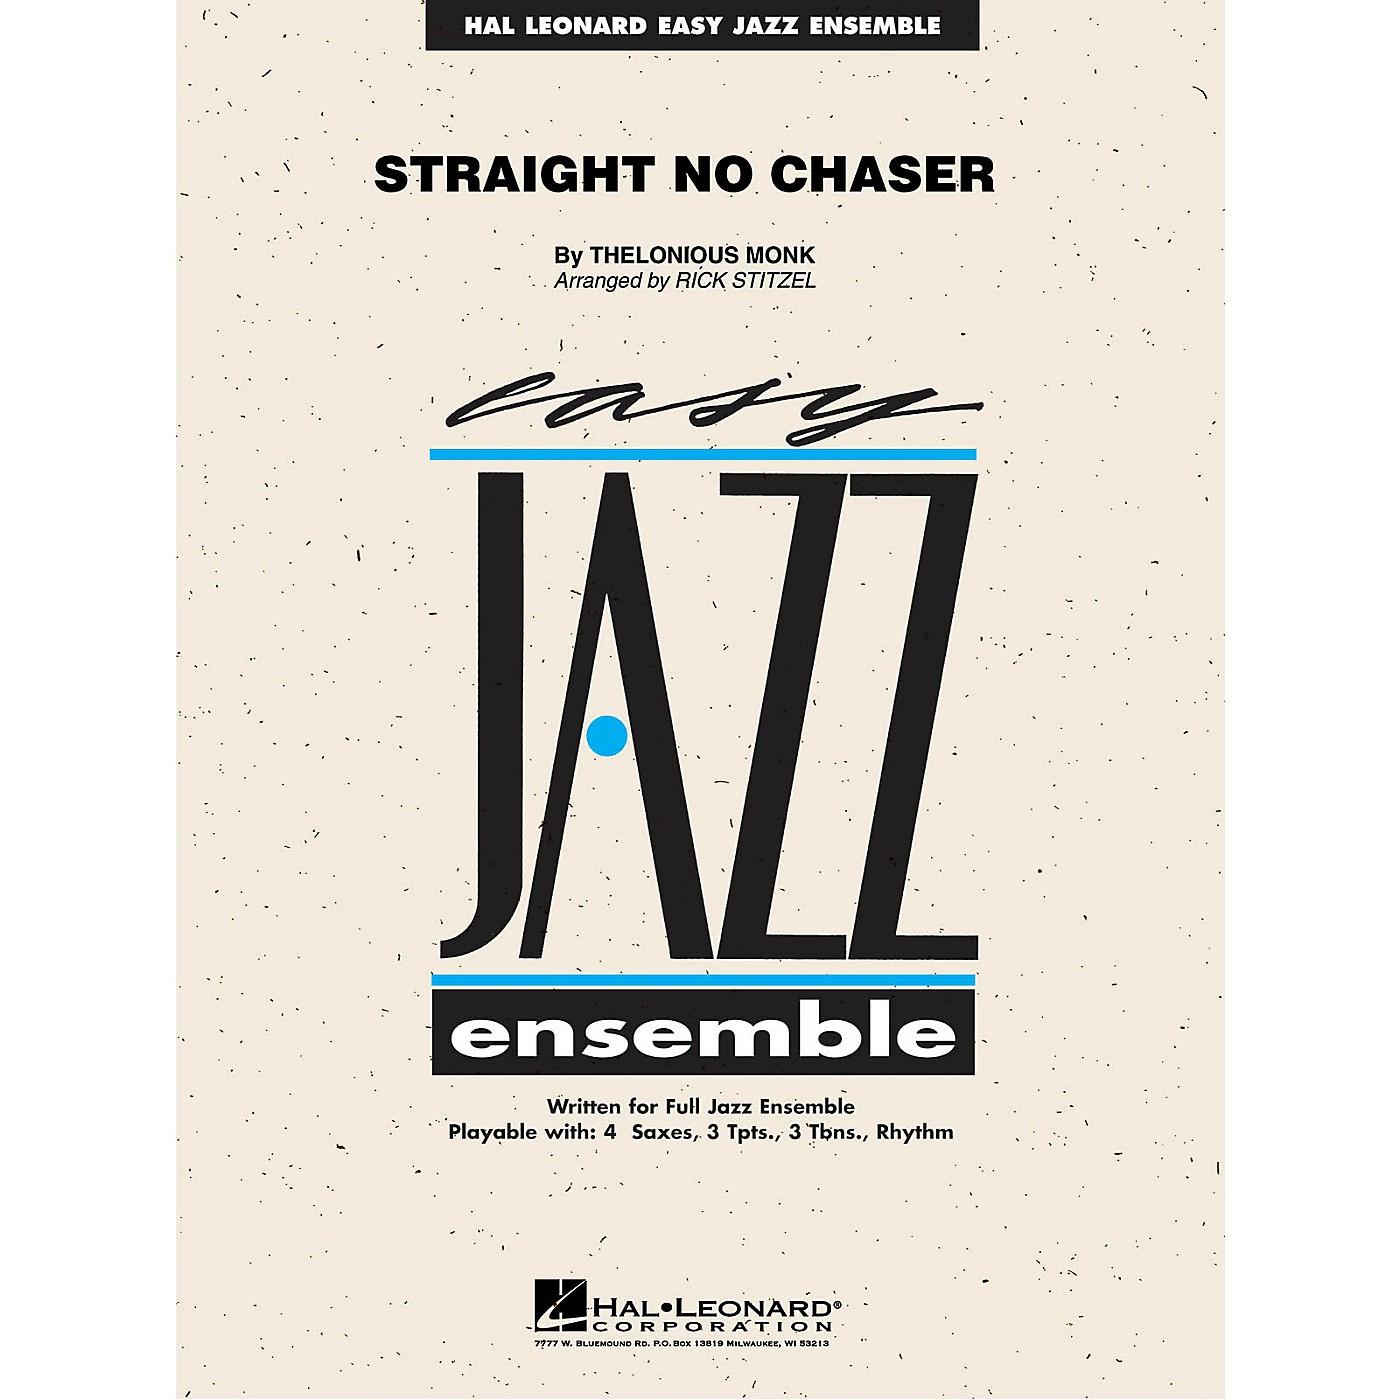 Hal Leonard Straight No Chaser Jazz Band Level 2 Arranged by Rick Stitzel thumbnail